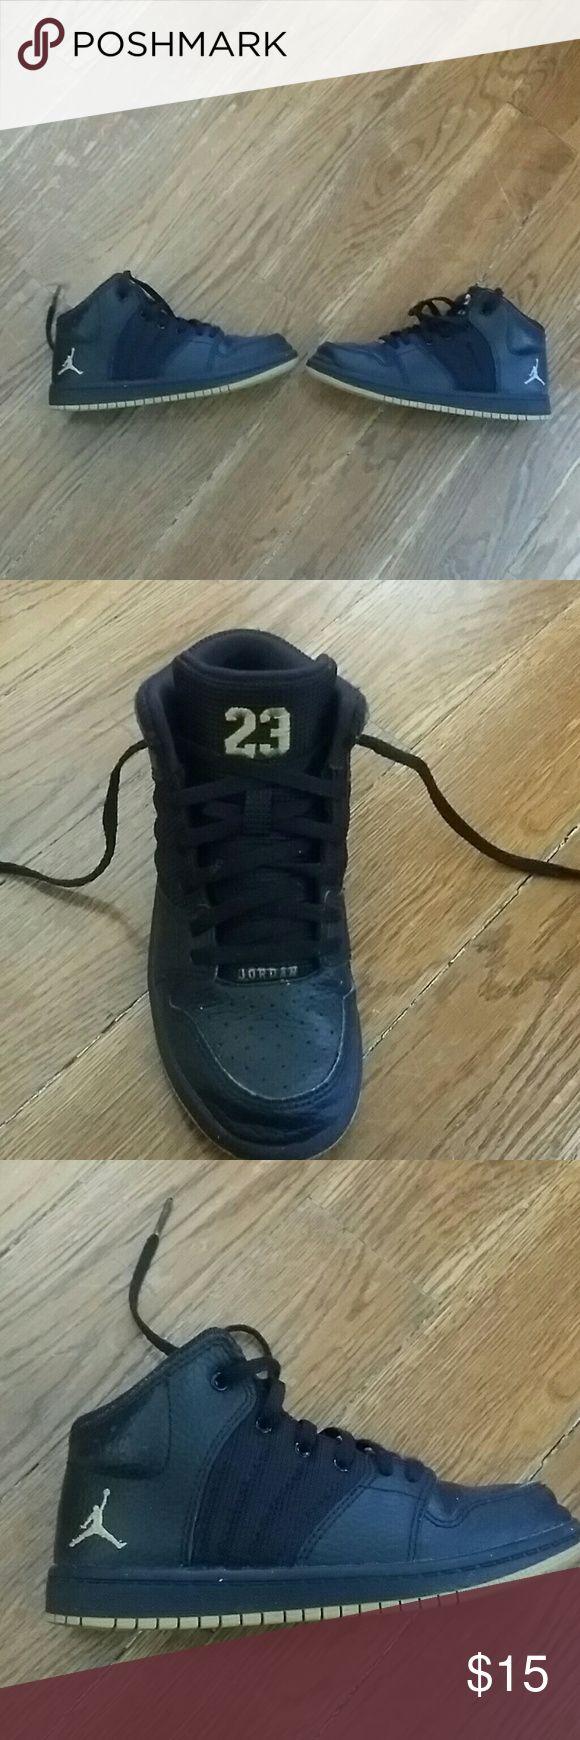 Jordan shoes Kids Jordan shoes black and gold gently worn Jordan Shoes Sneakers